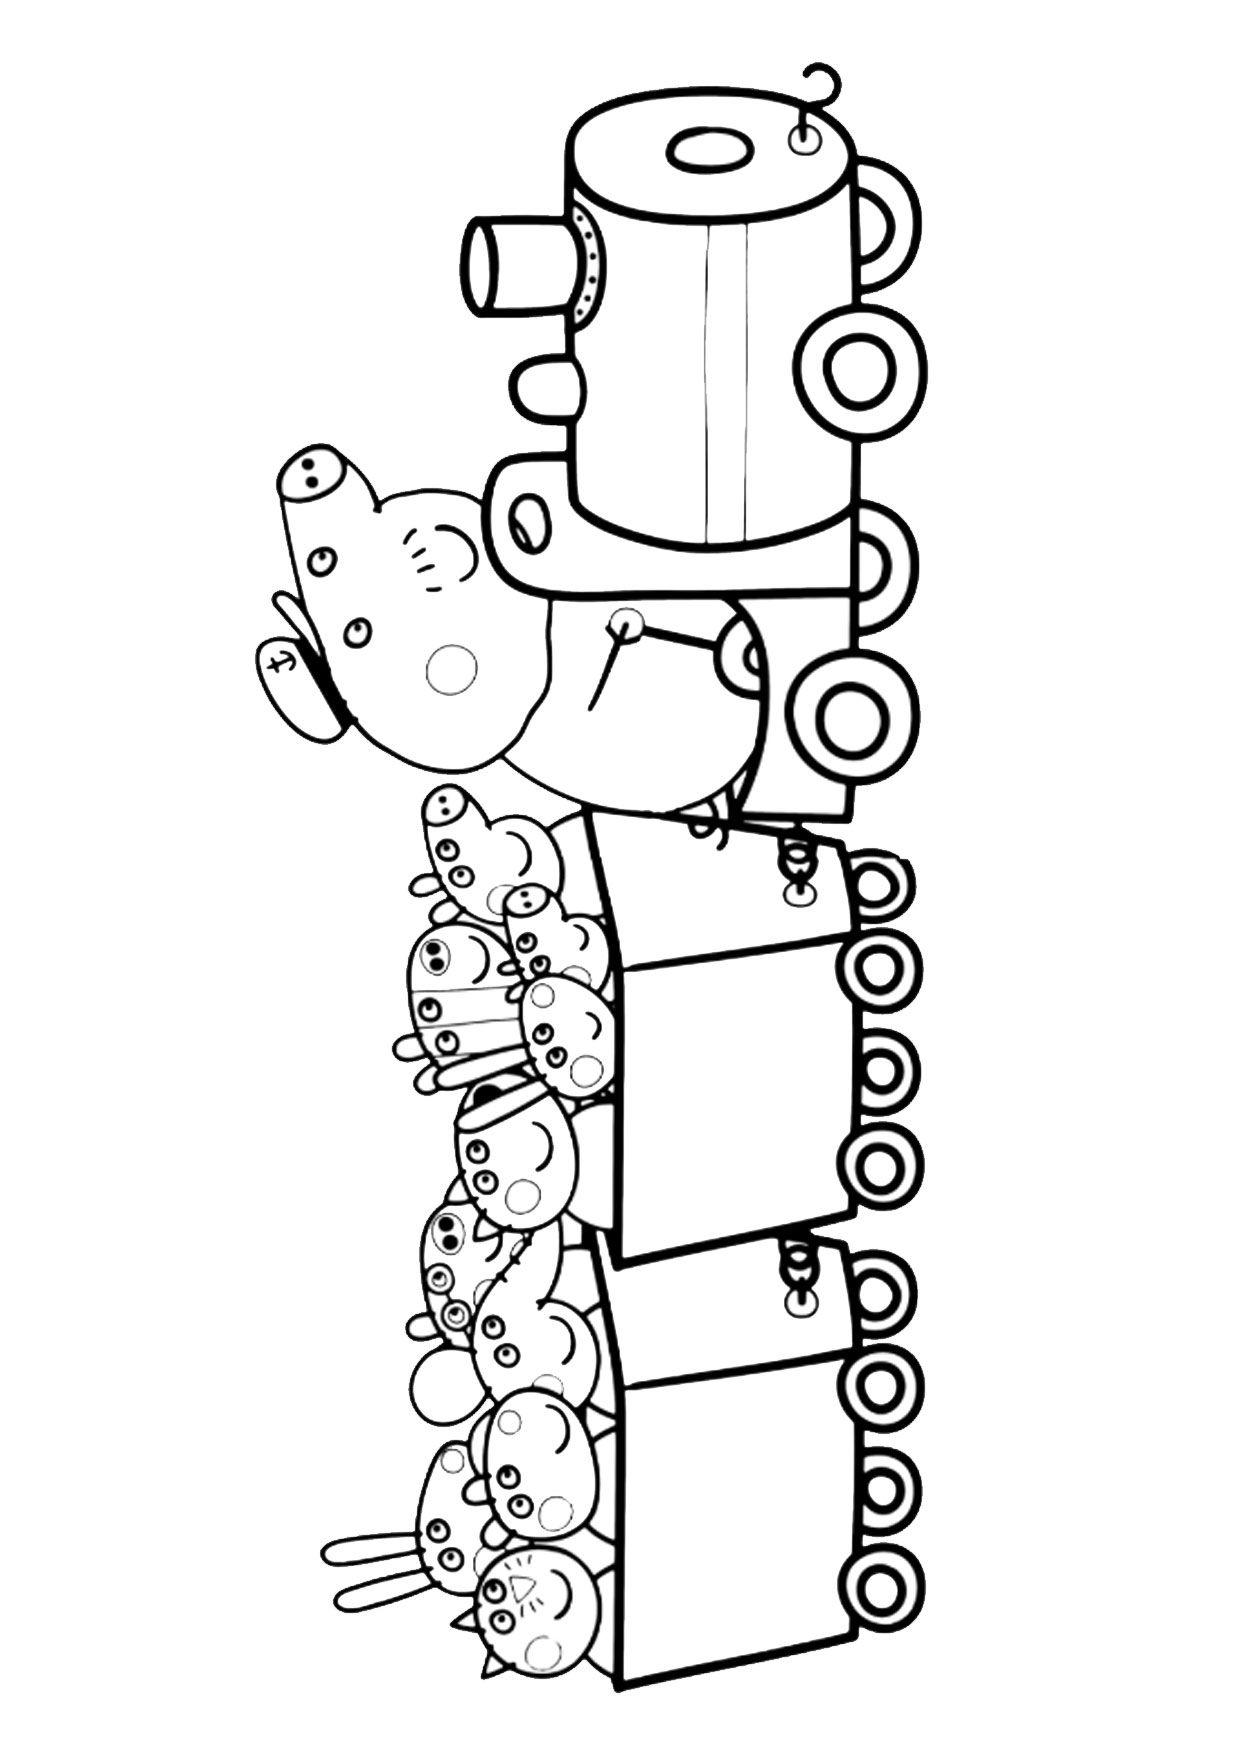 54 Disegni Di Peppa Pig Da Colorare